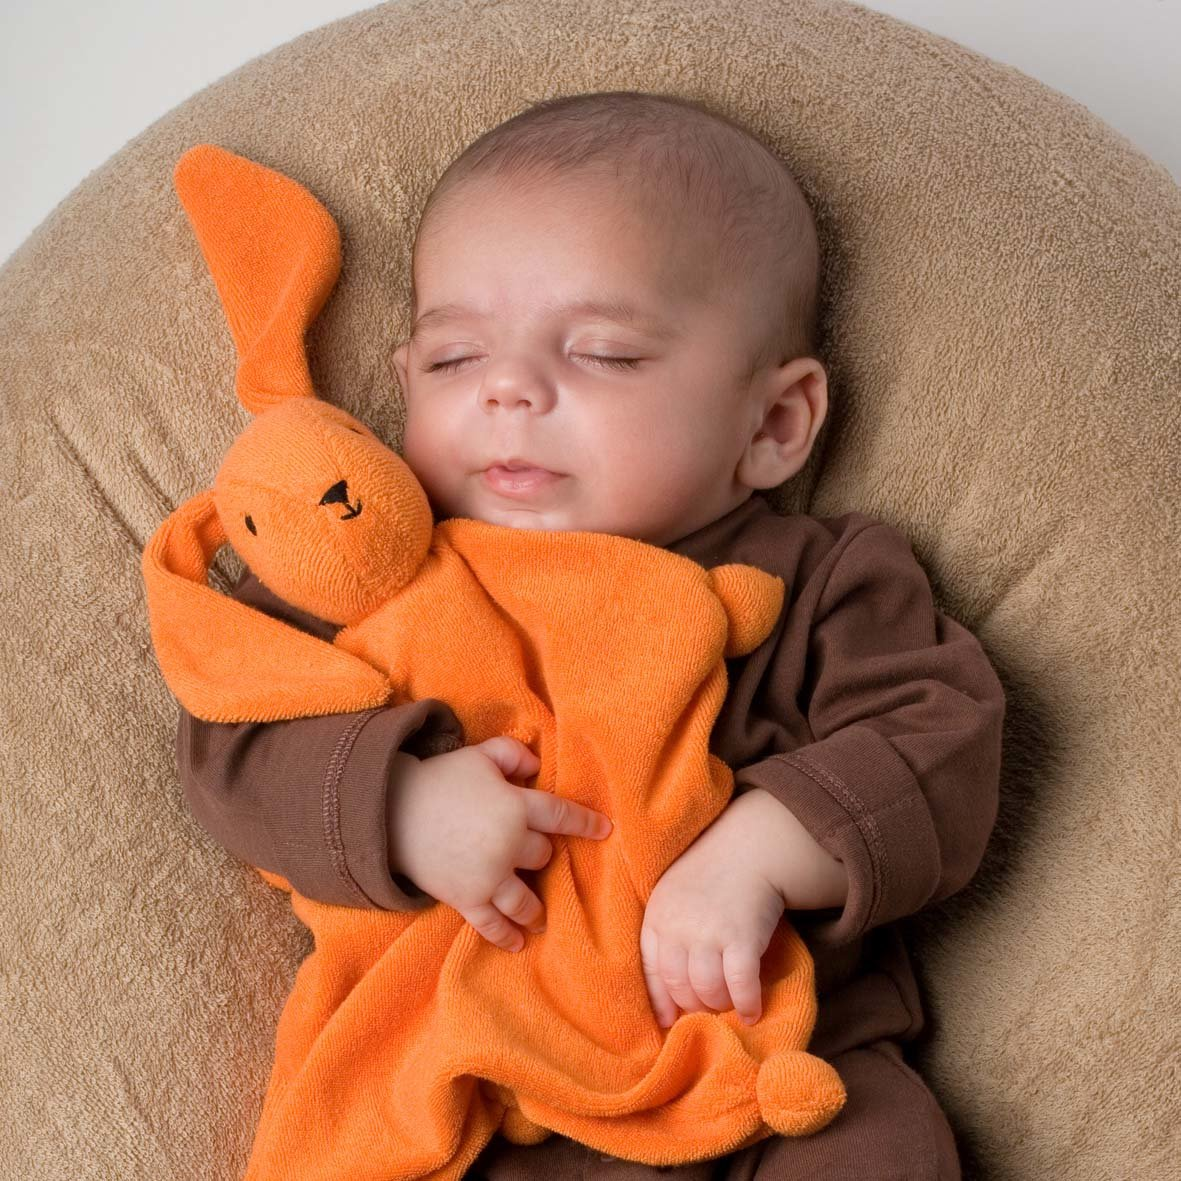 Игрушка для сна ребенка своими руками крючком 4